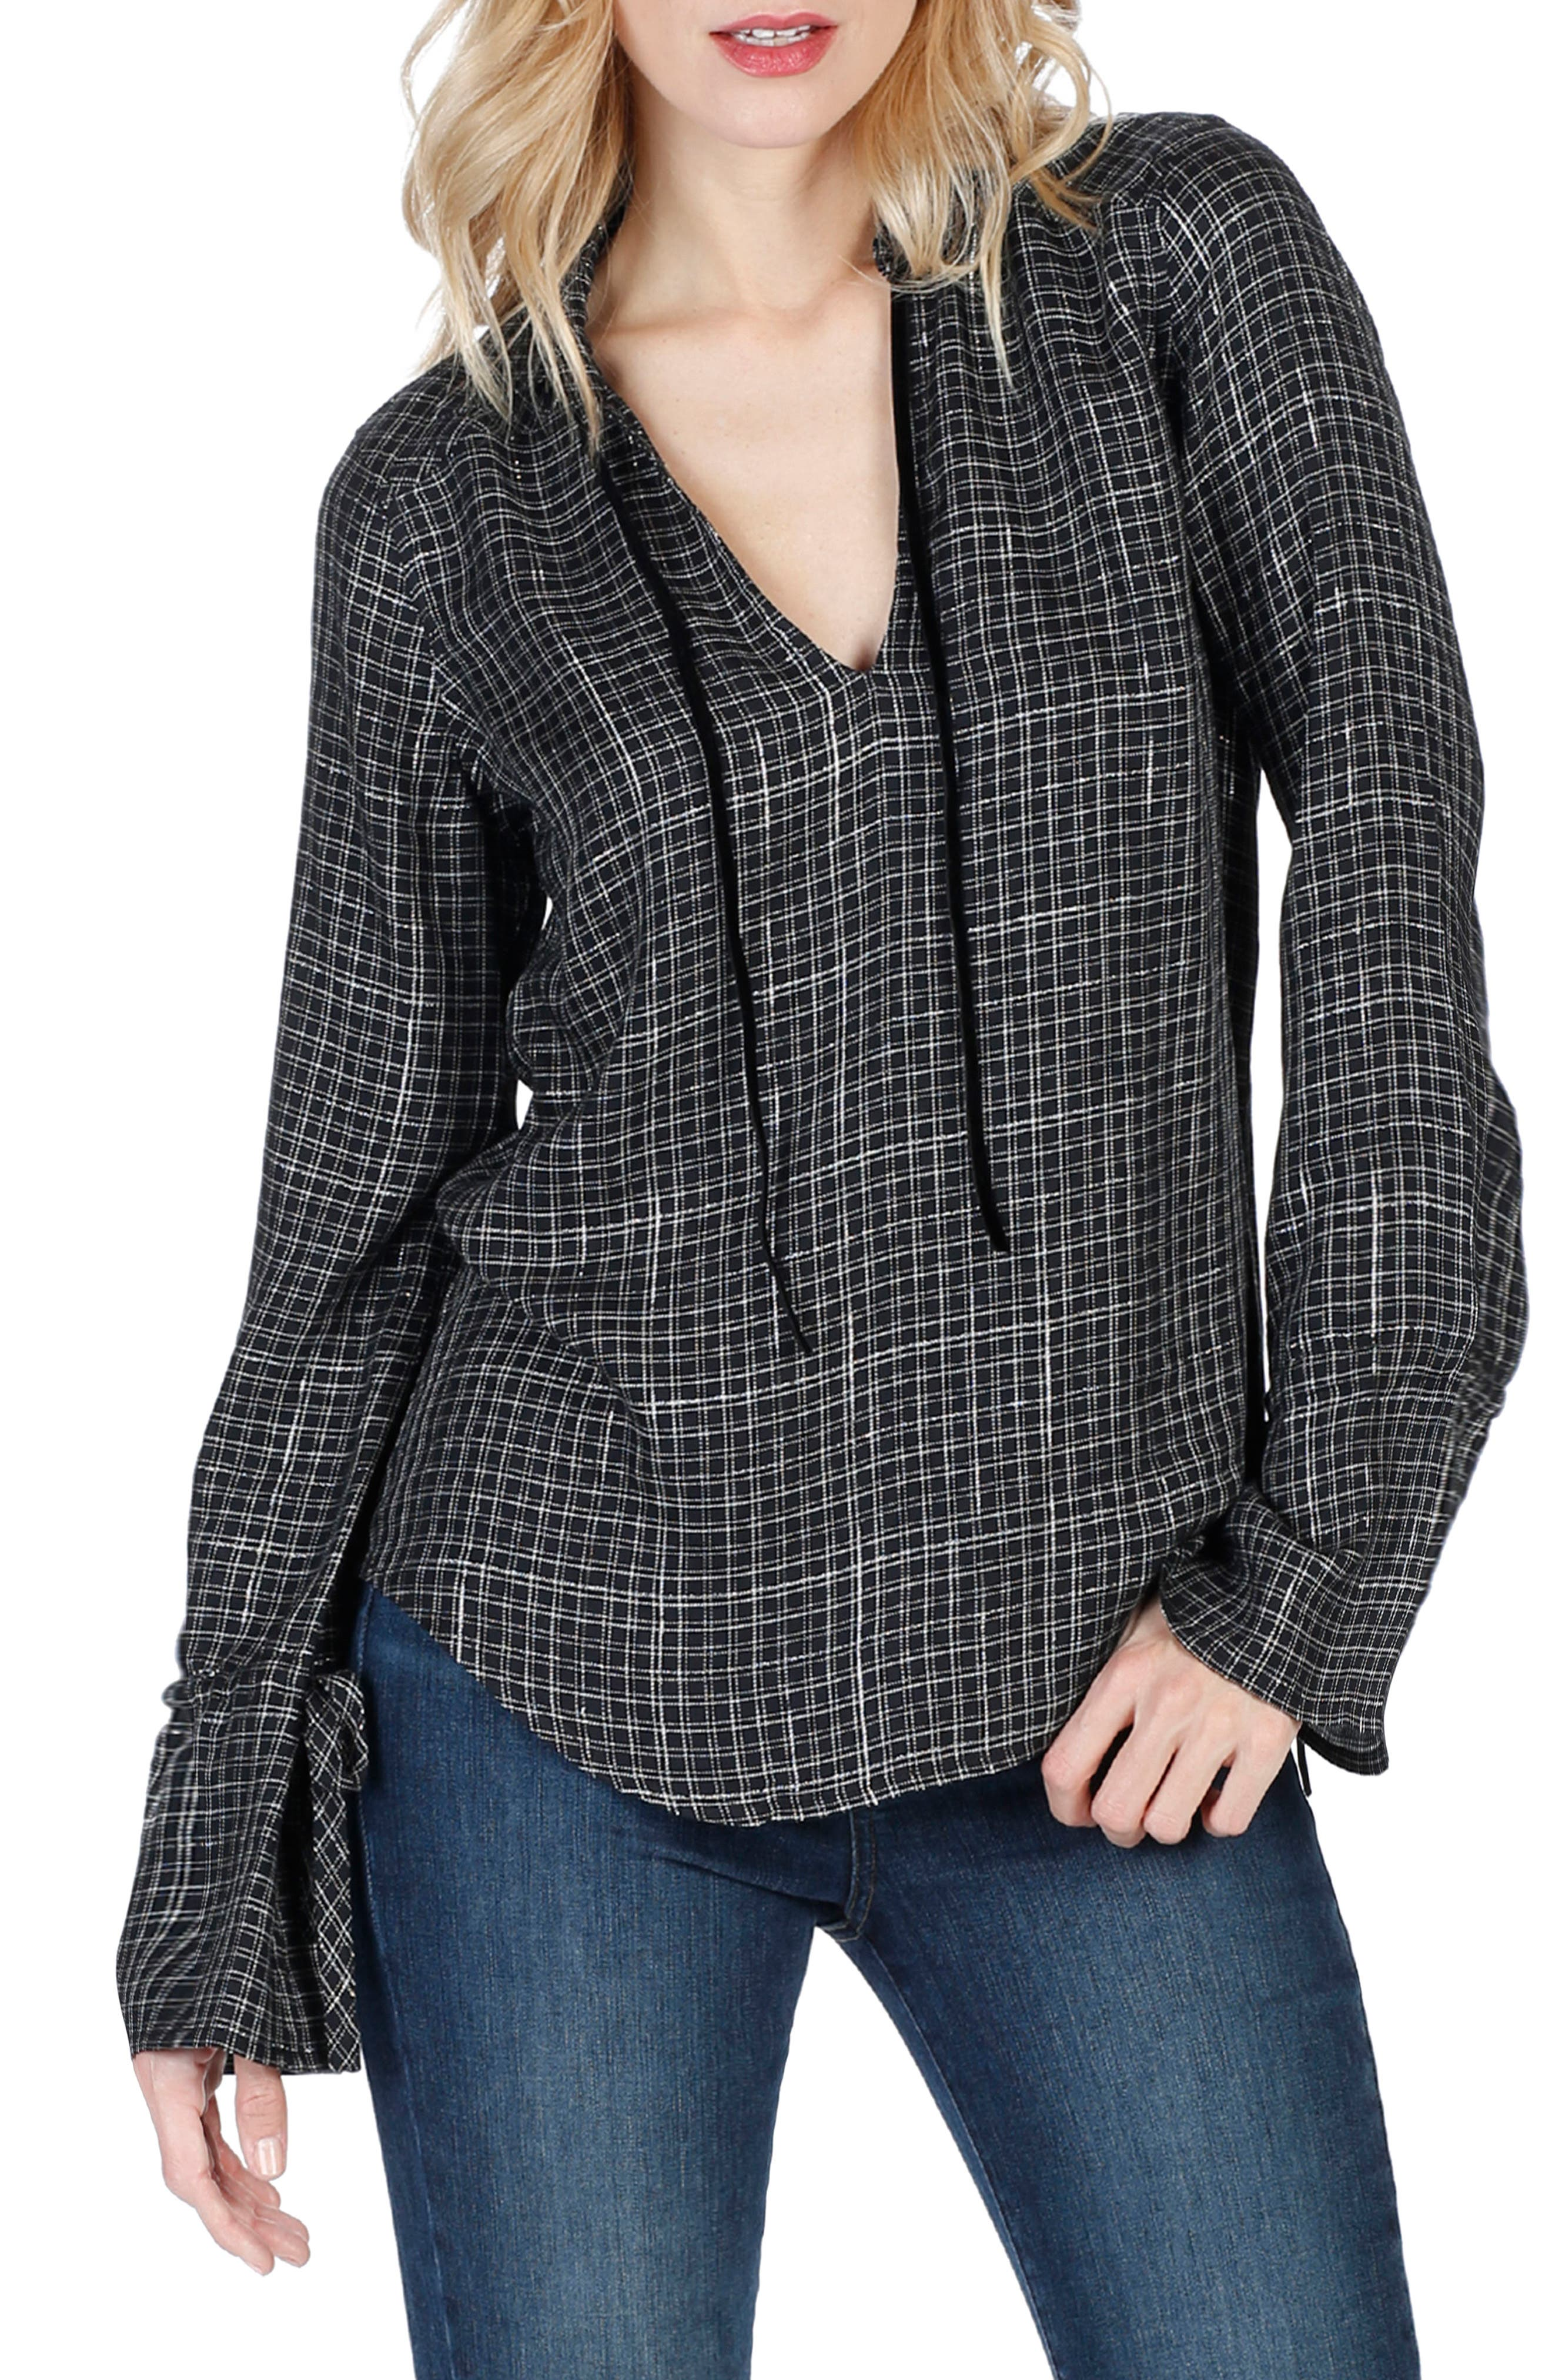 Calissa Shirt,                         Main,                         color, Black Gunmetal Lurex